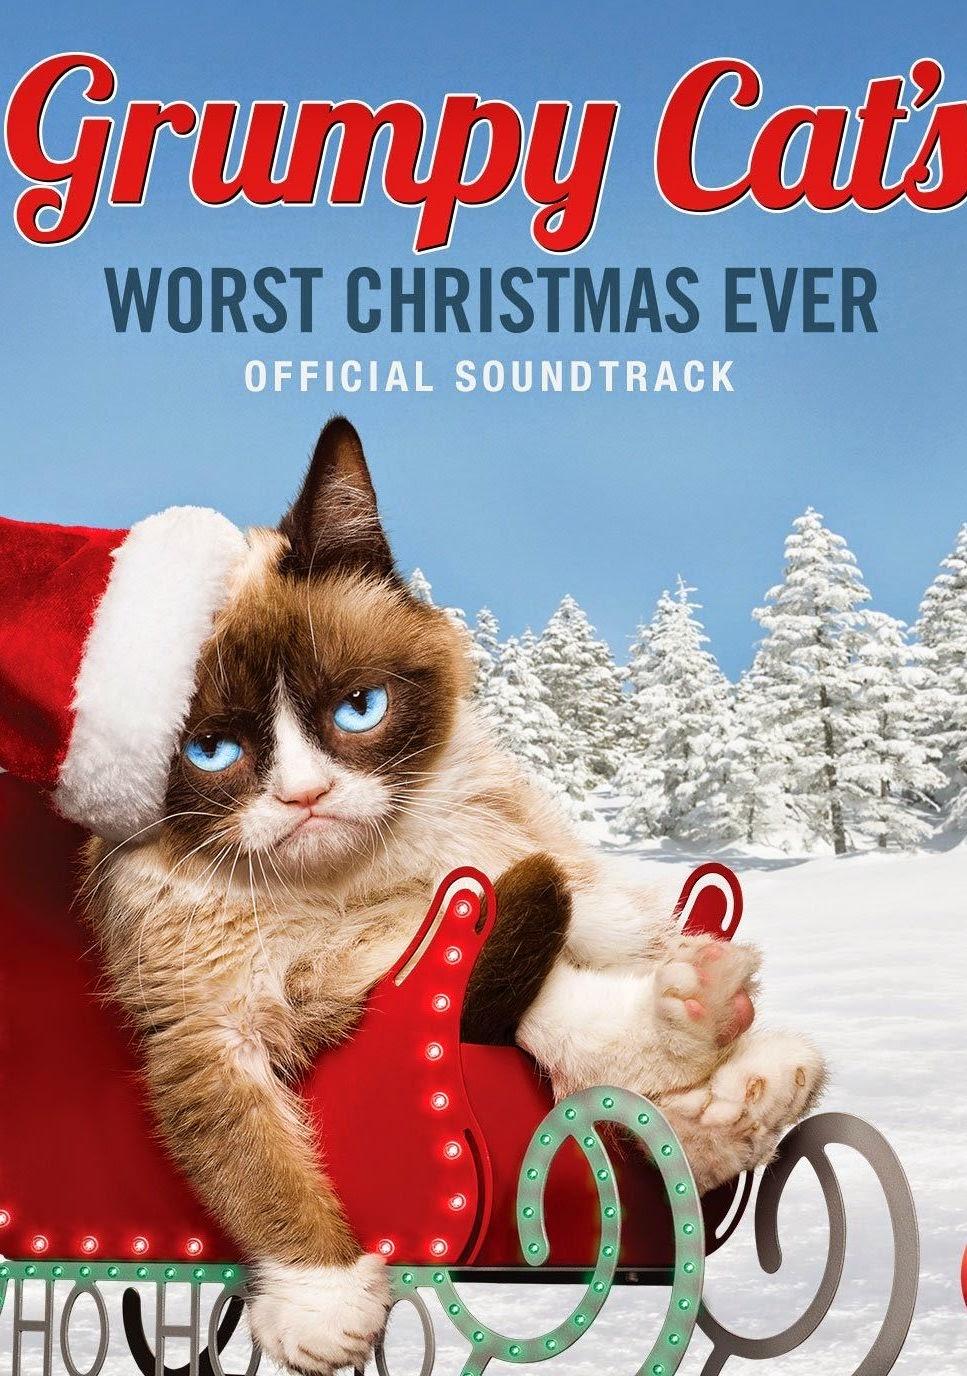 Grumpy-Cat-Worst-Christmas-Ever-Poster.jpg